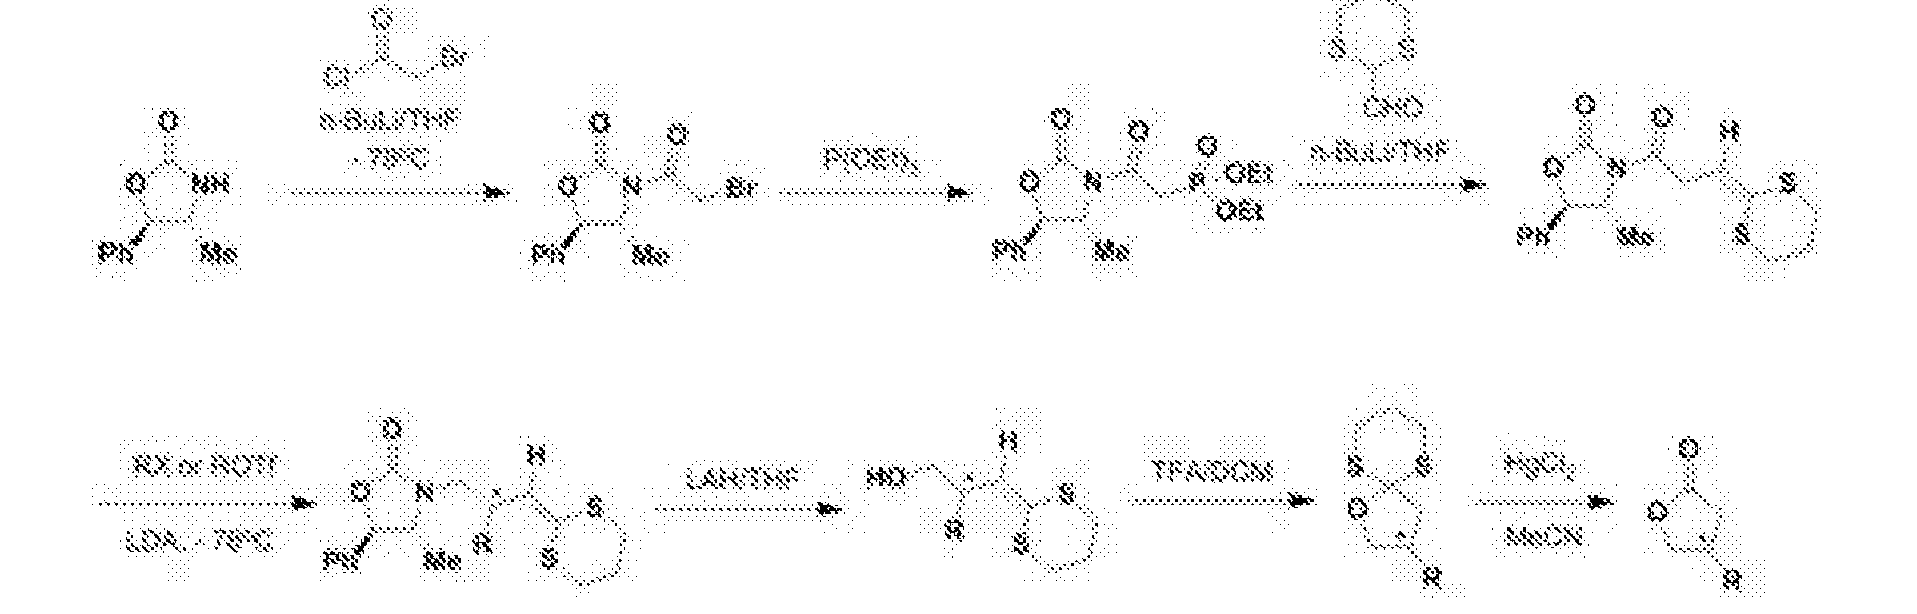 Figure CN105837535AD00061